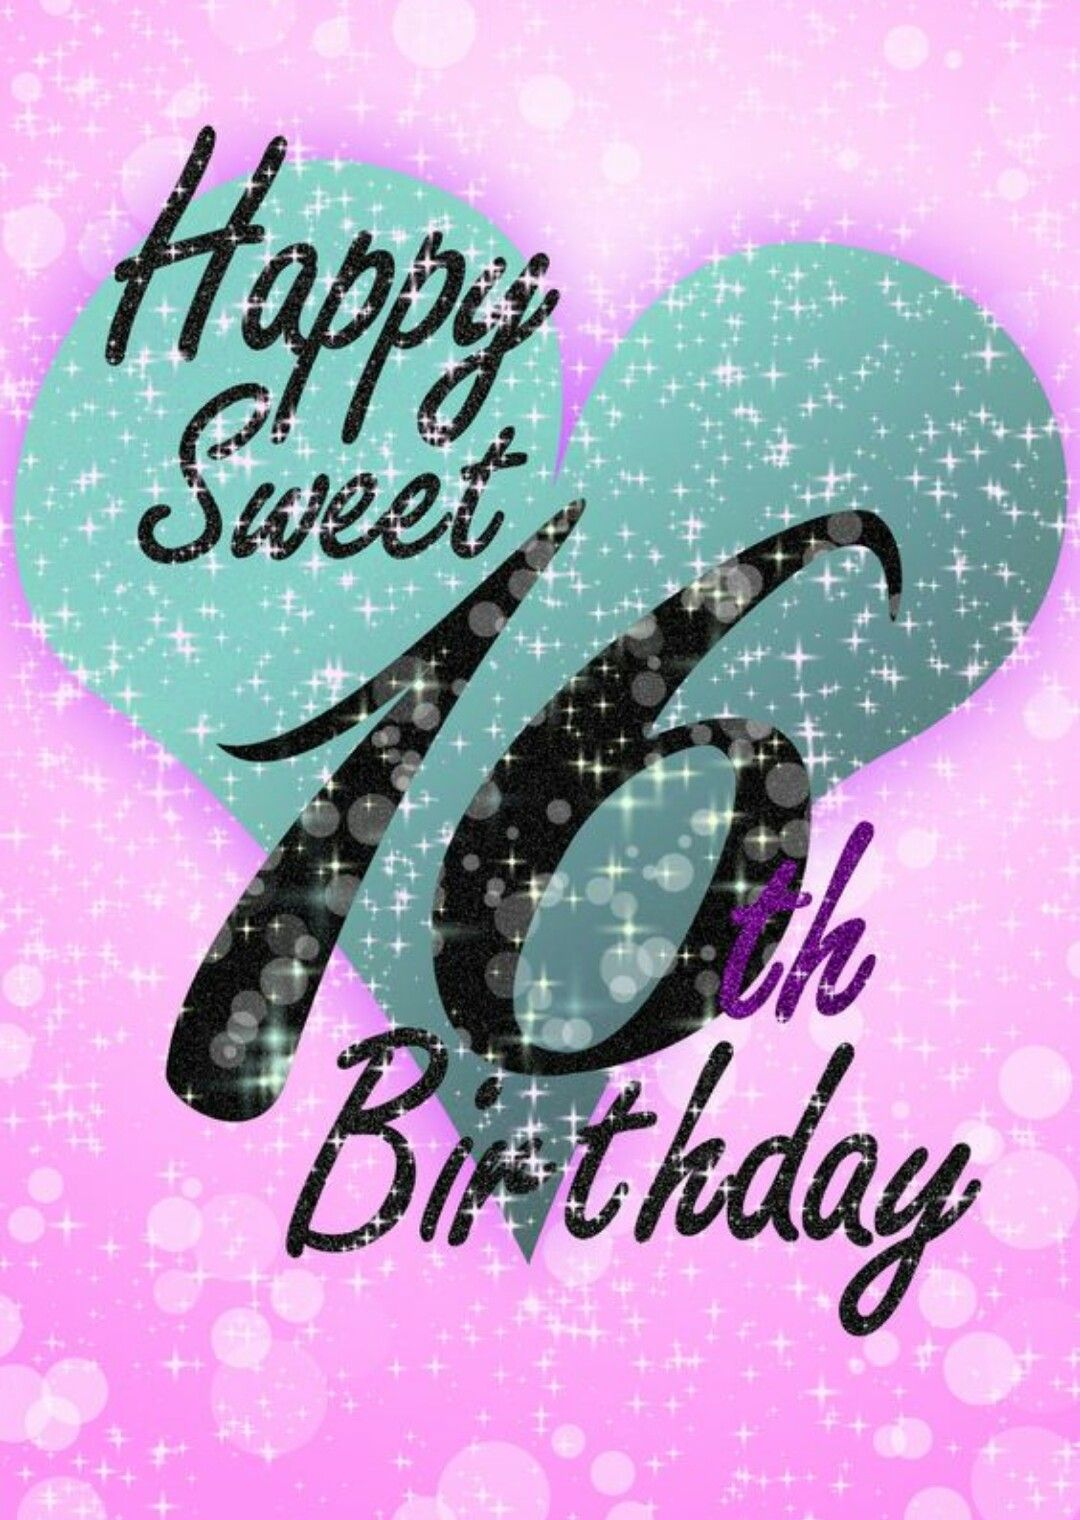 Happy Sweet 16th Birthday 16th Birthday Card 16th Birthday